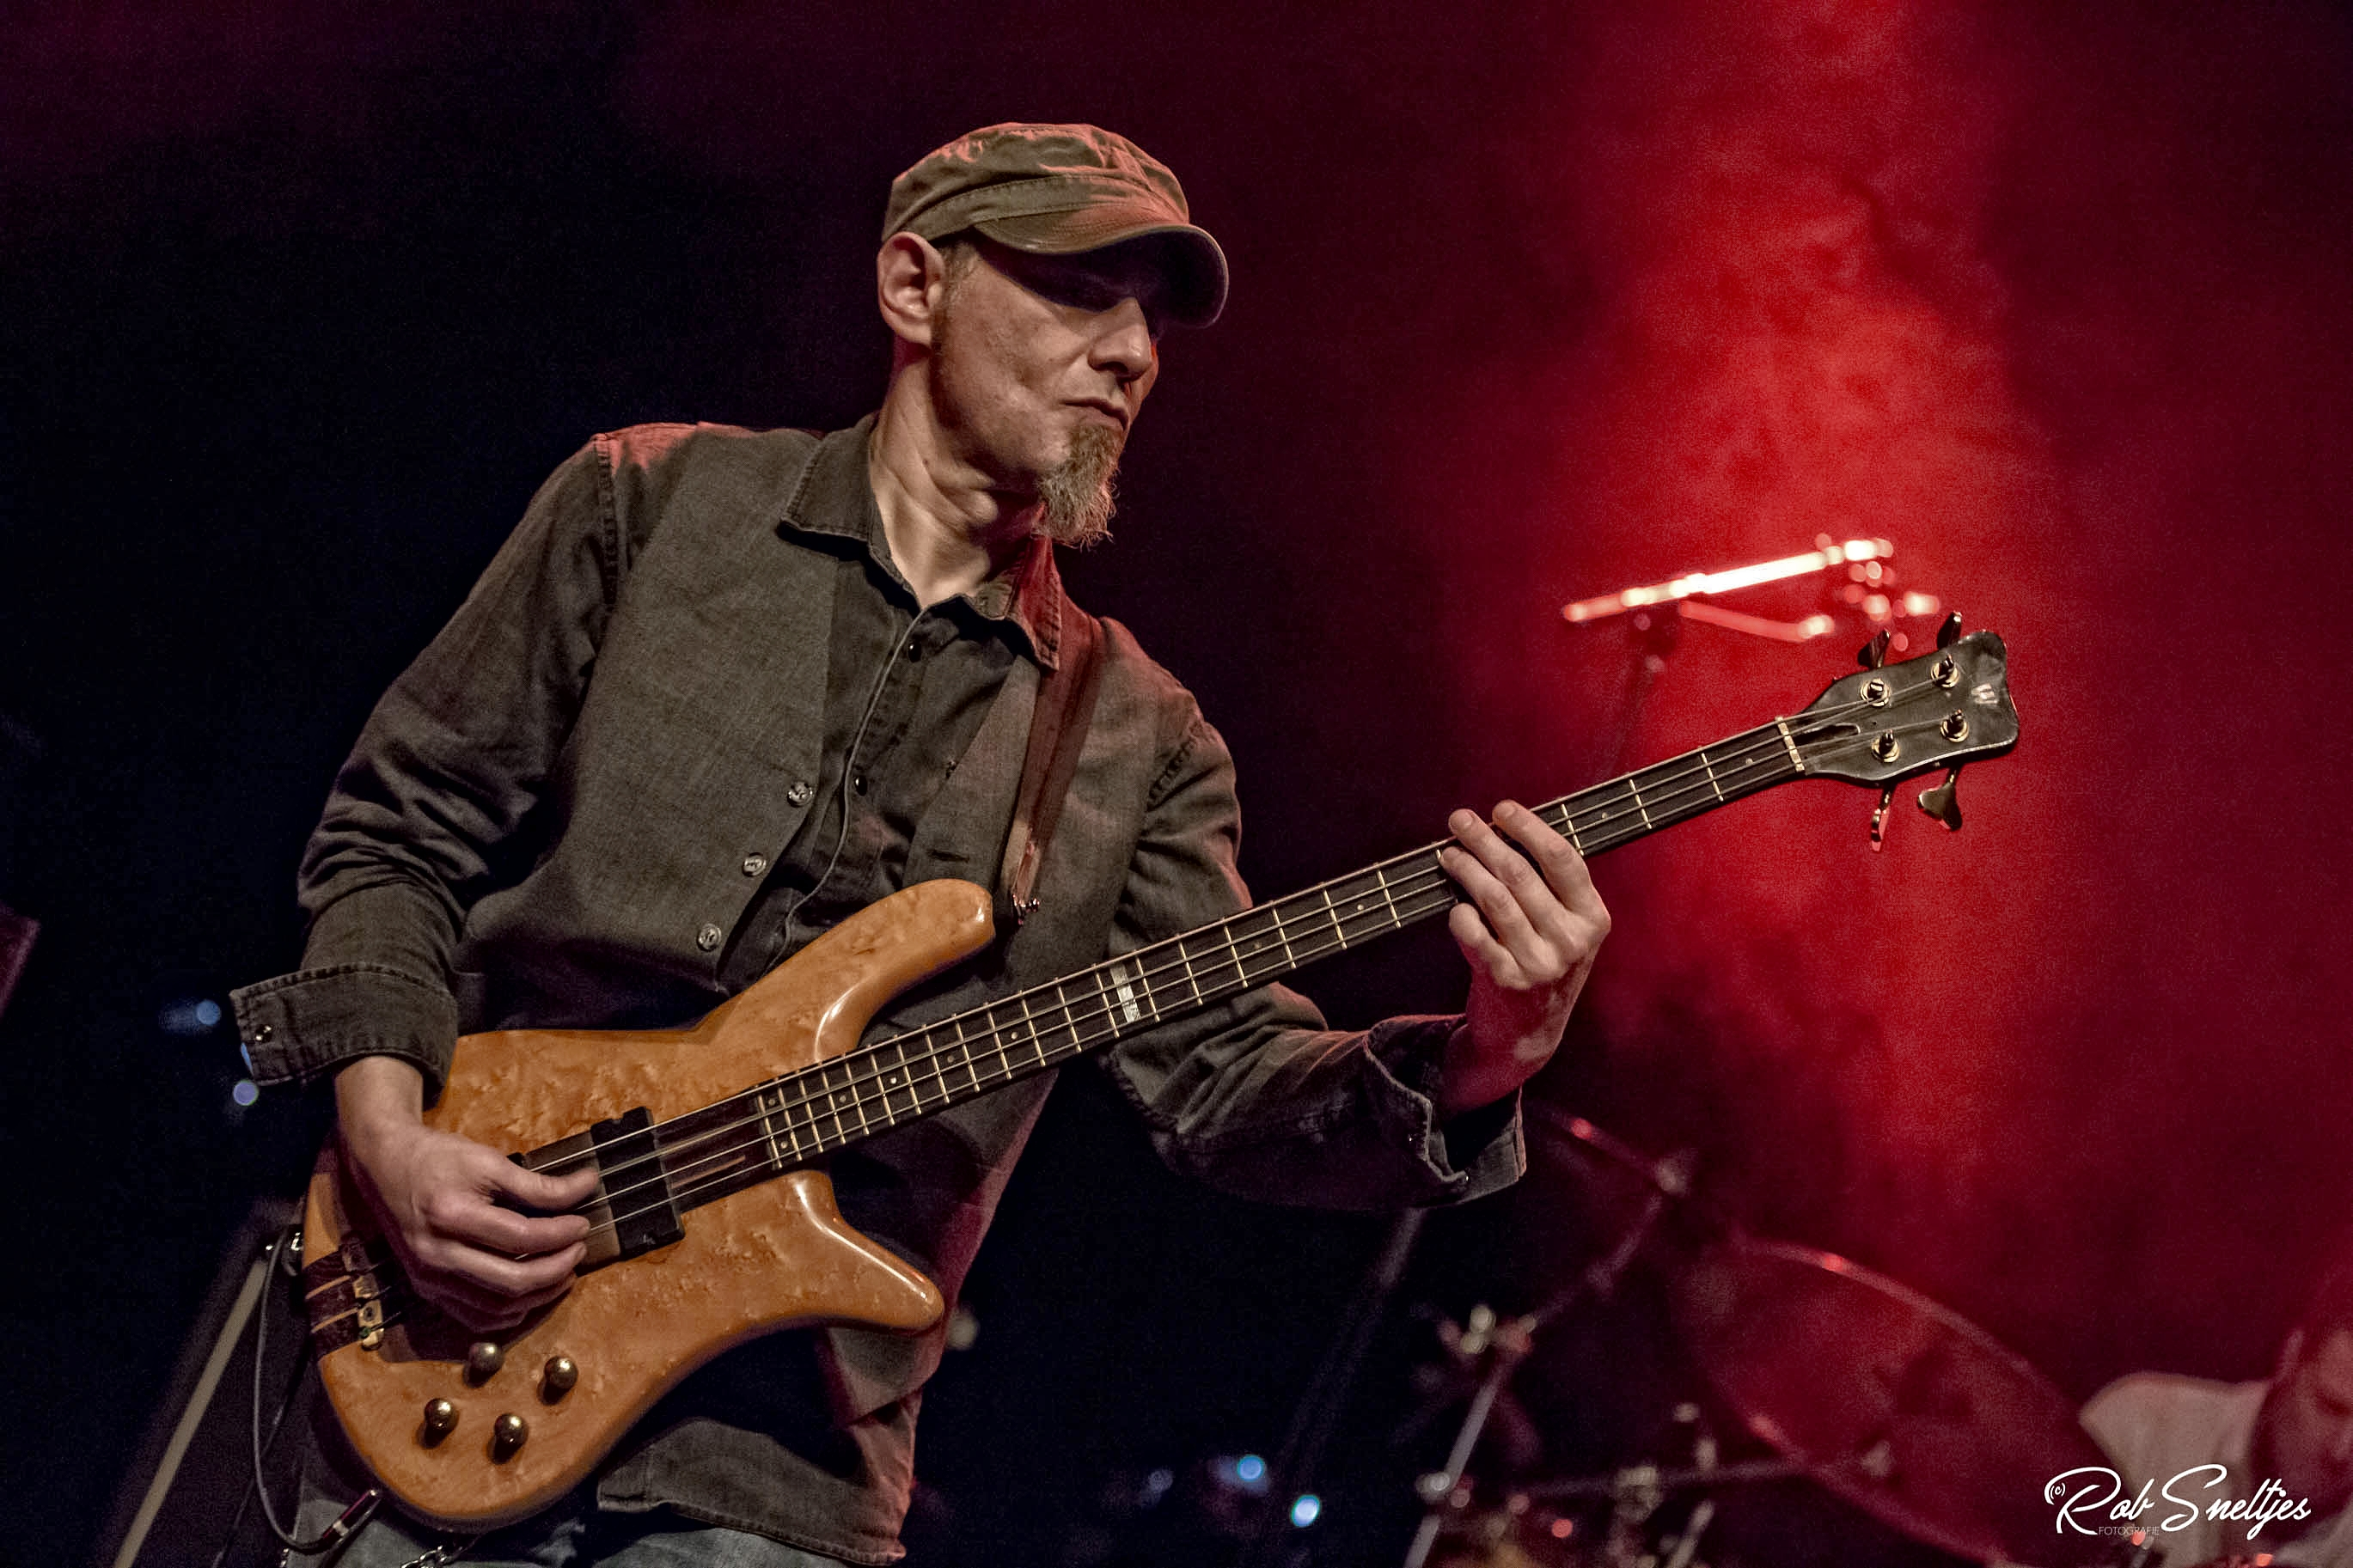 Julian-Sas-Band-Luxor-Live-Arnhem-2018-©RobSneltjes6K4A5273-copy-59